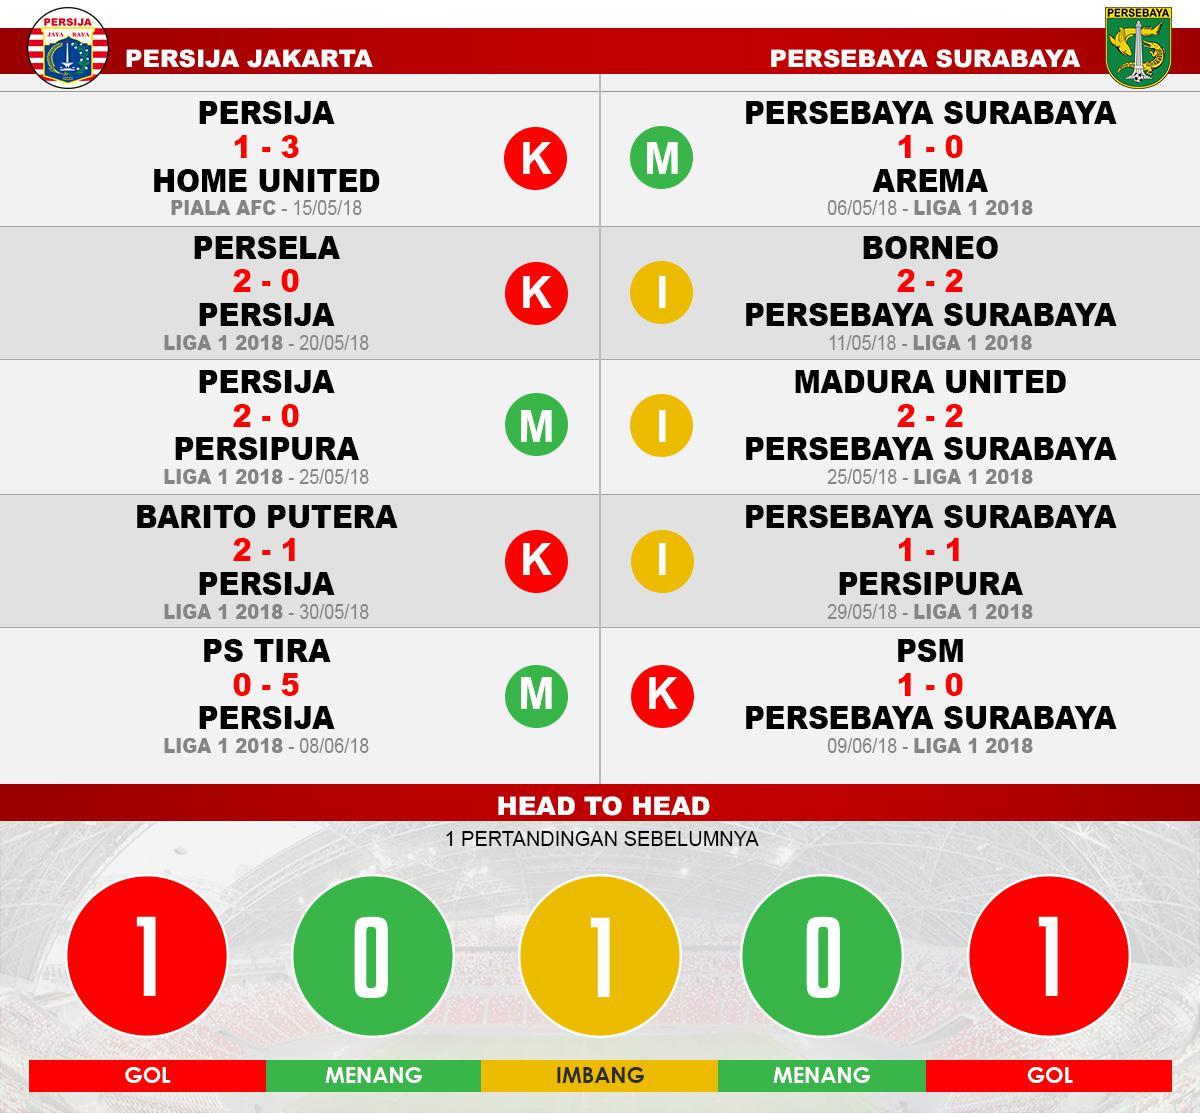 Persija vs Persebaya Copyright: Indosport.com